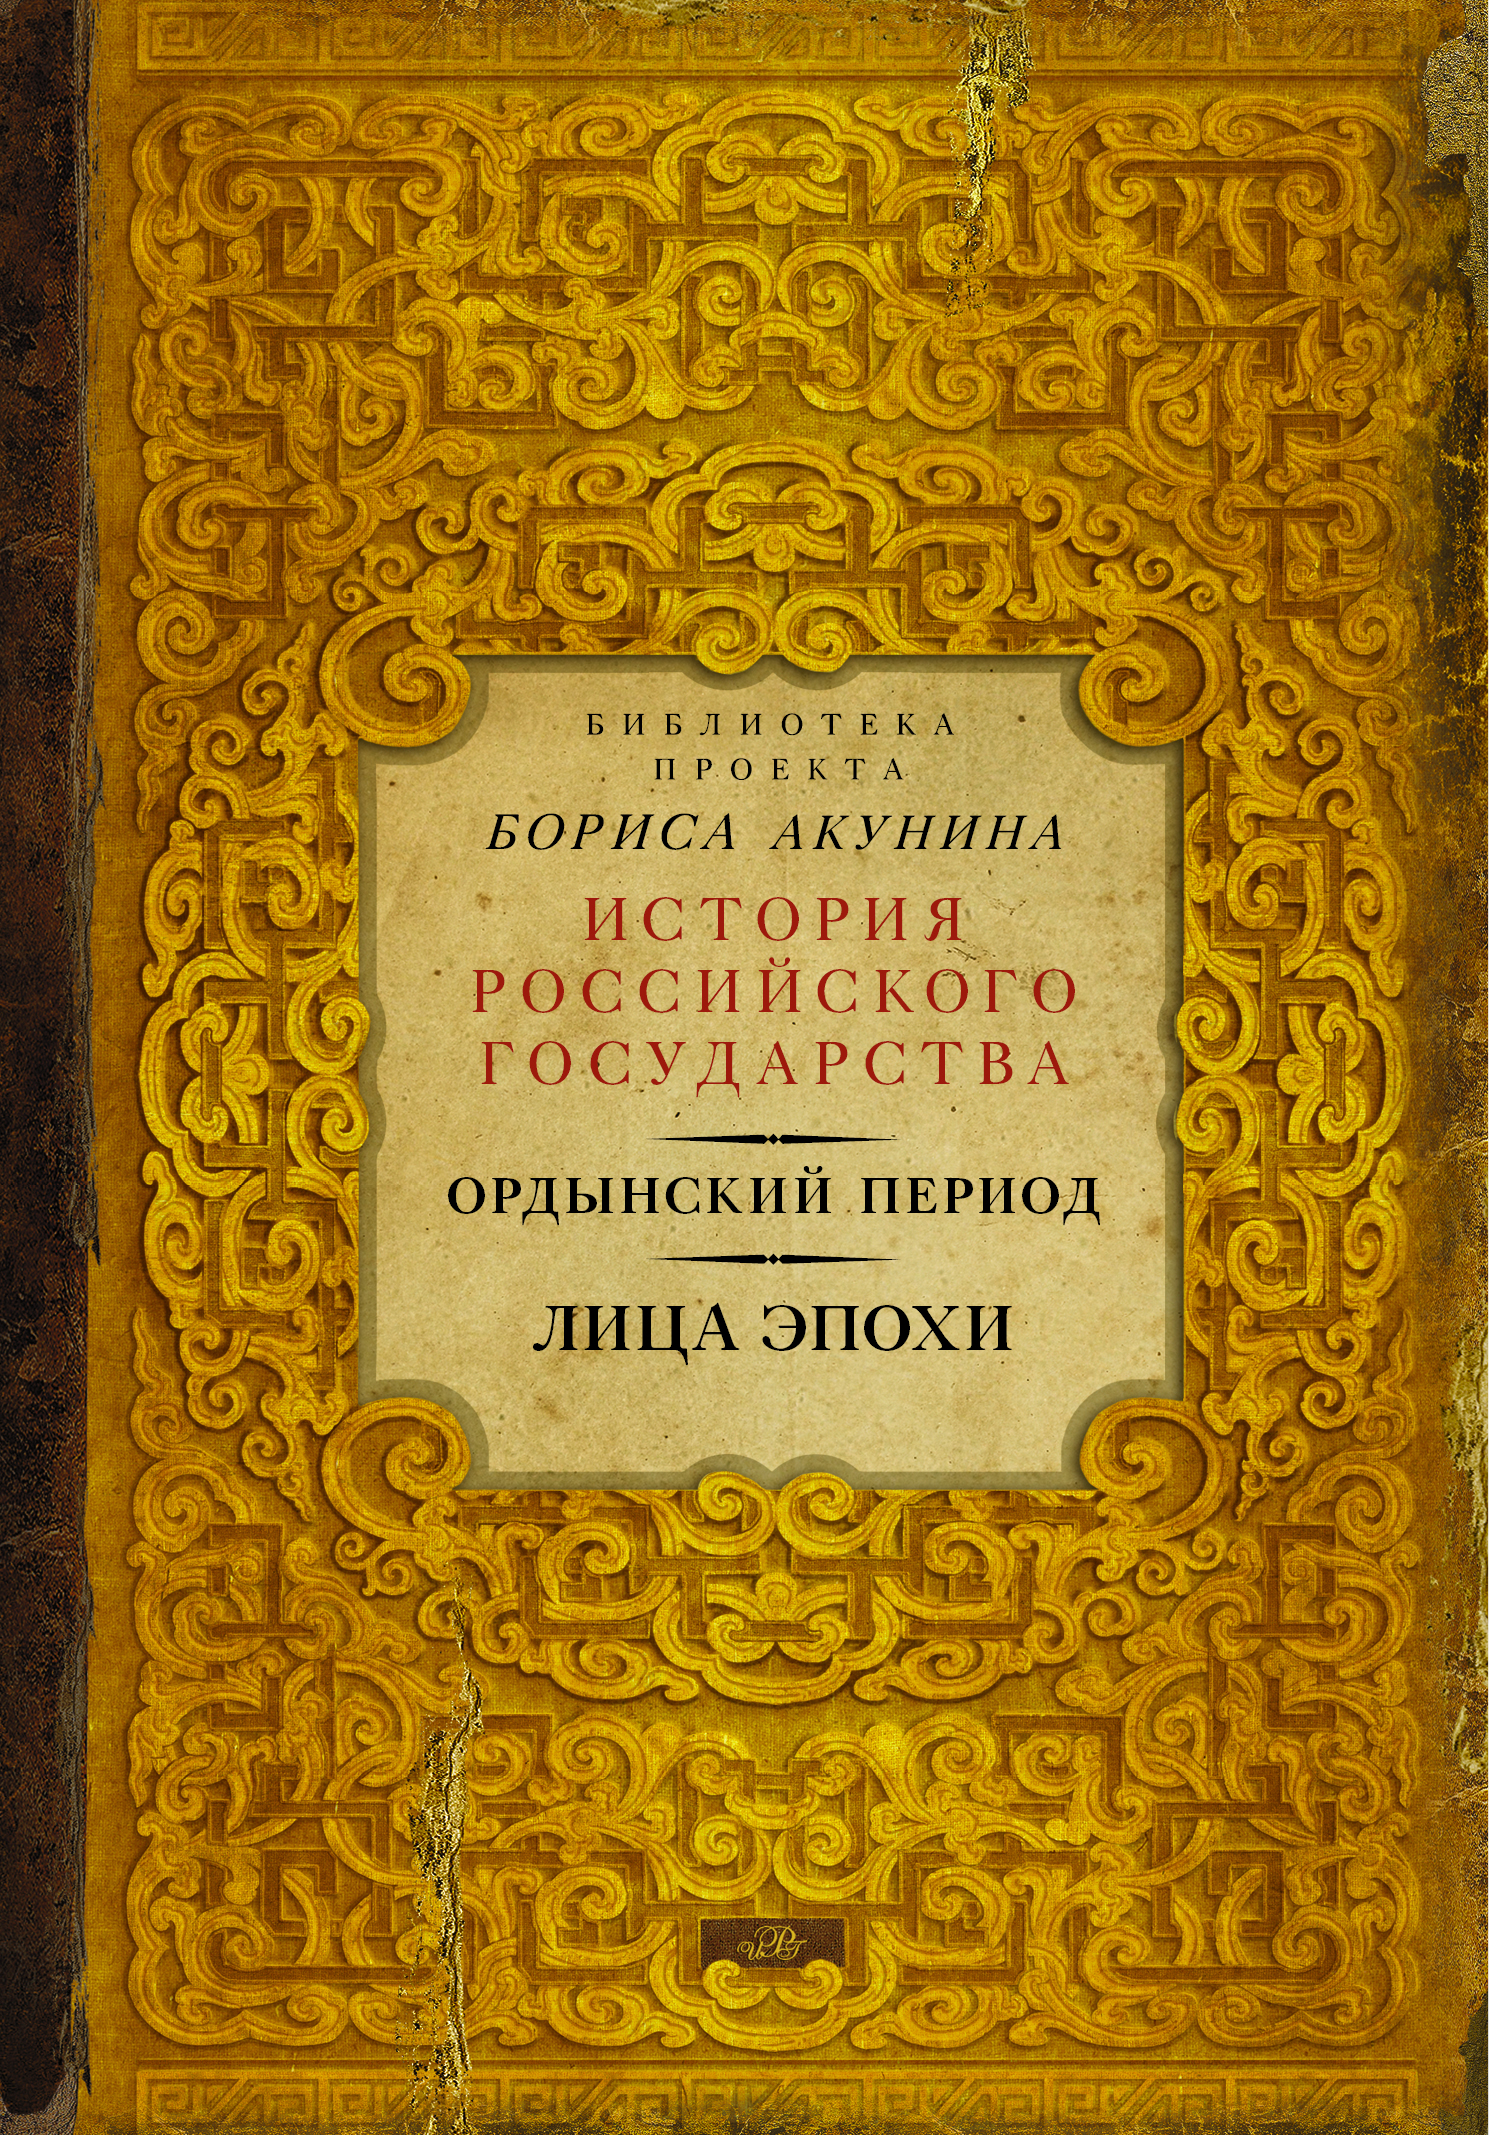 Борис Акунин Ордынский период. Лица эпохи (Библиотека проекта Бориса Акунина ИРГ)